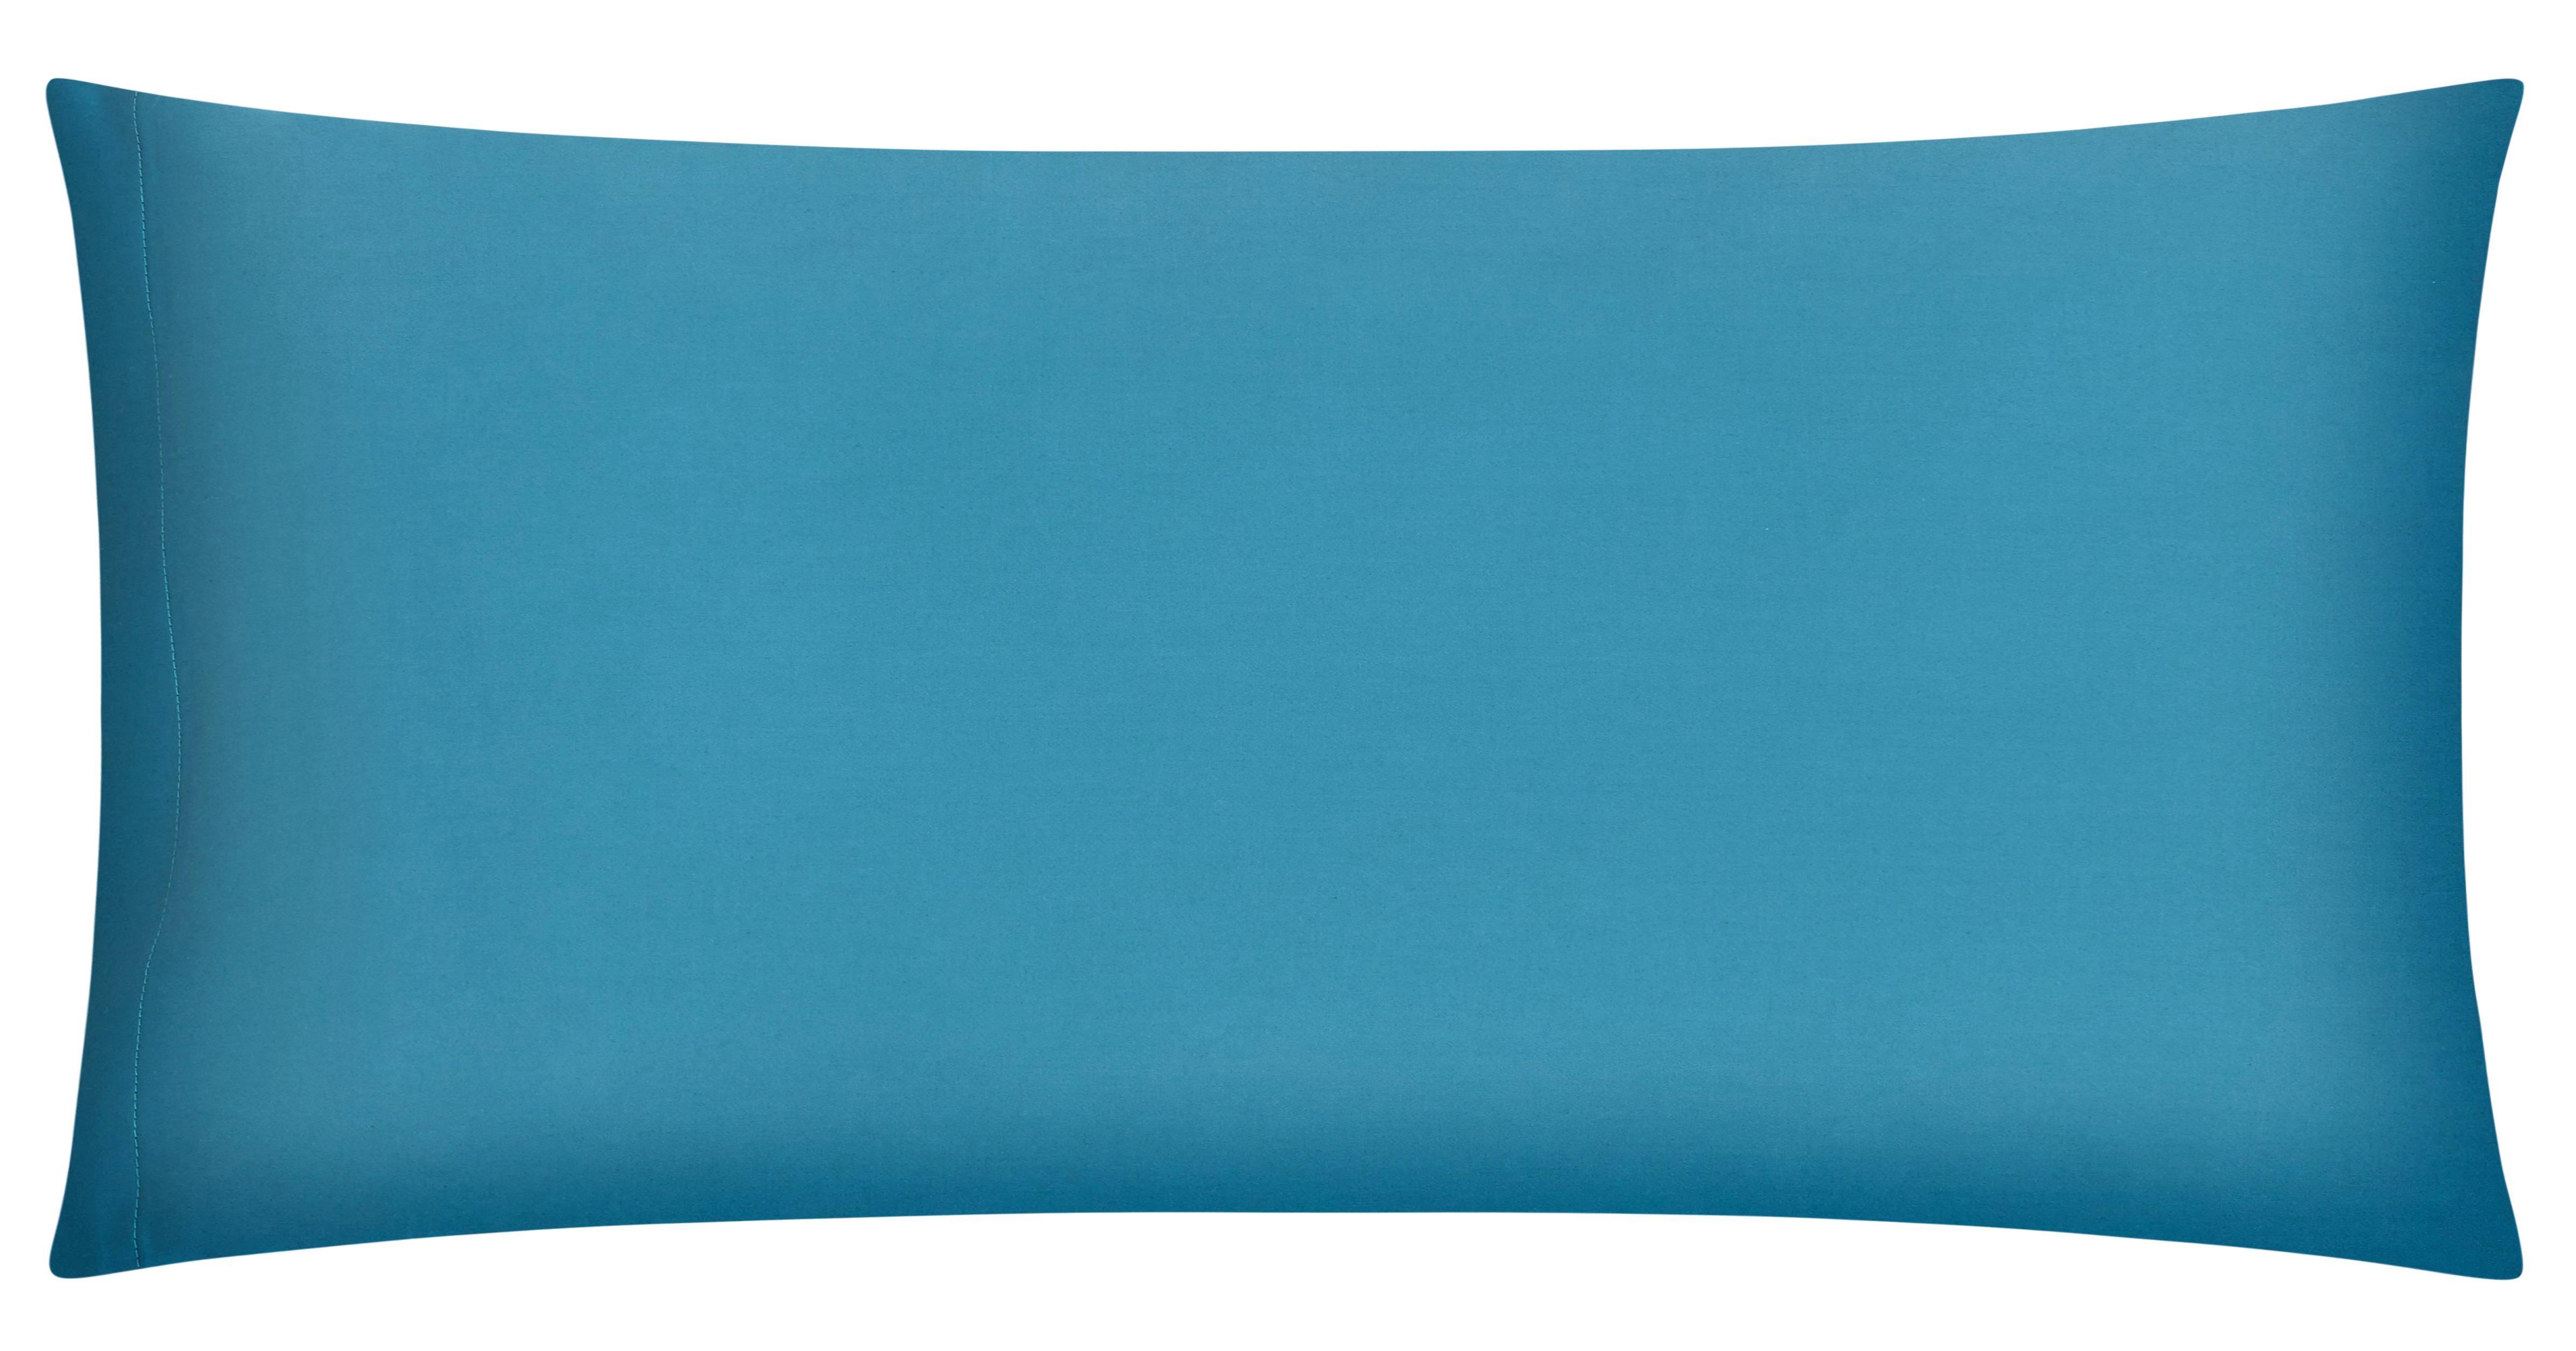 Kissenhülle Belinda, ca. 40x80cm - Türkis/Petrol, Textil (40/80cm) - PREMIUM LIVING